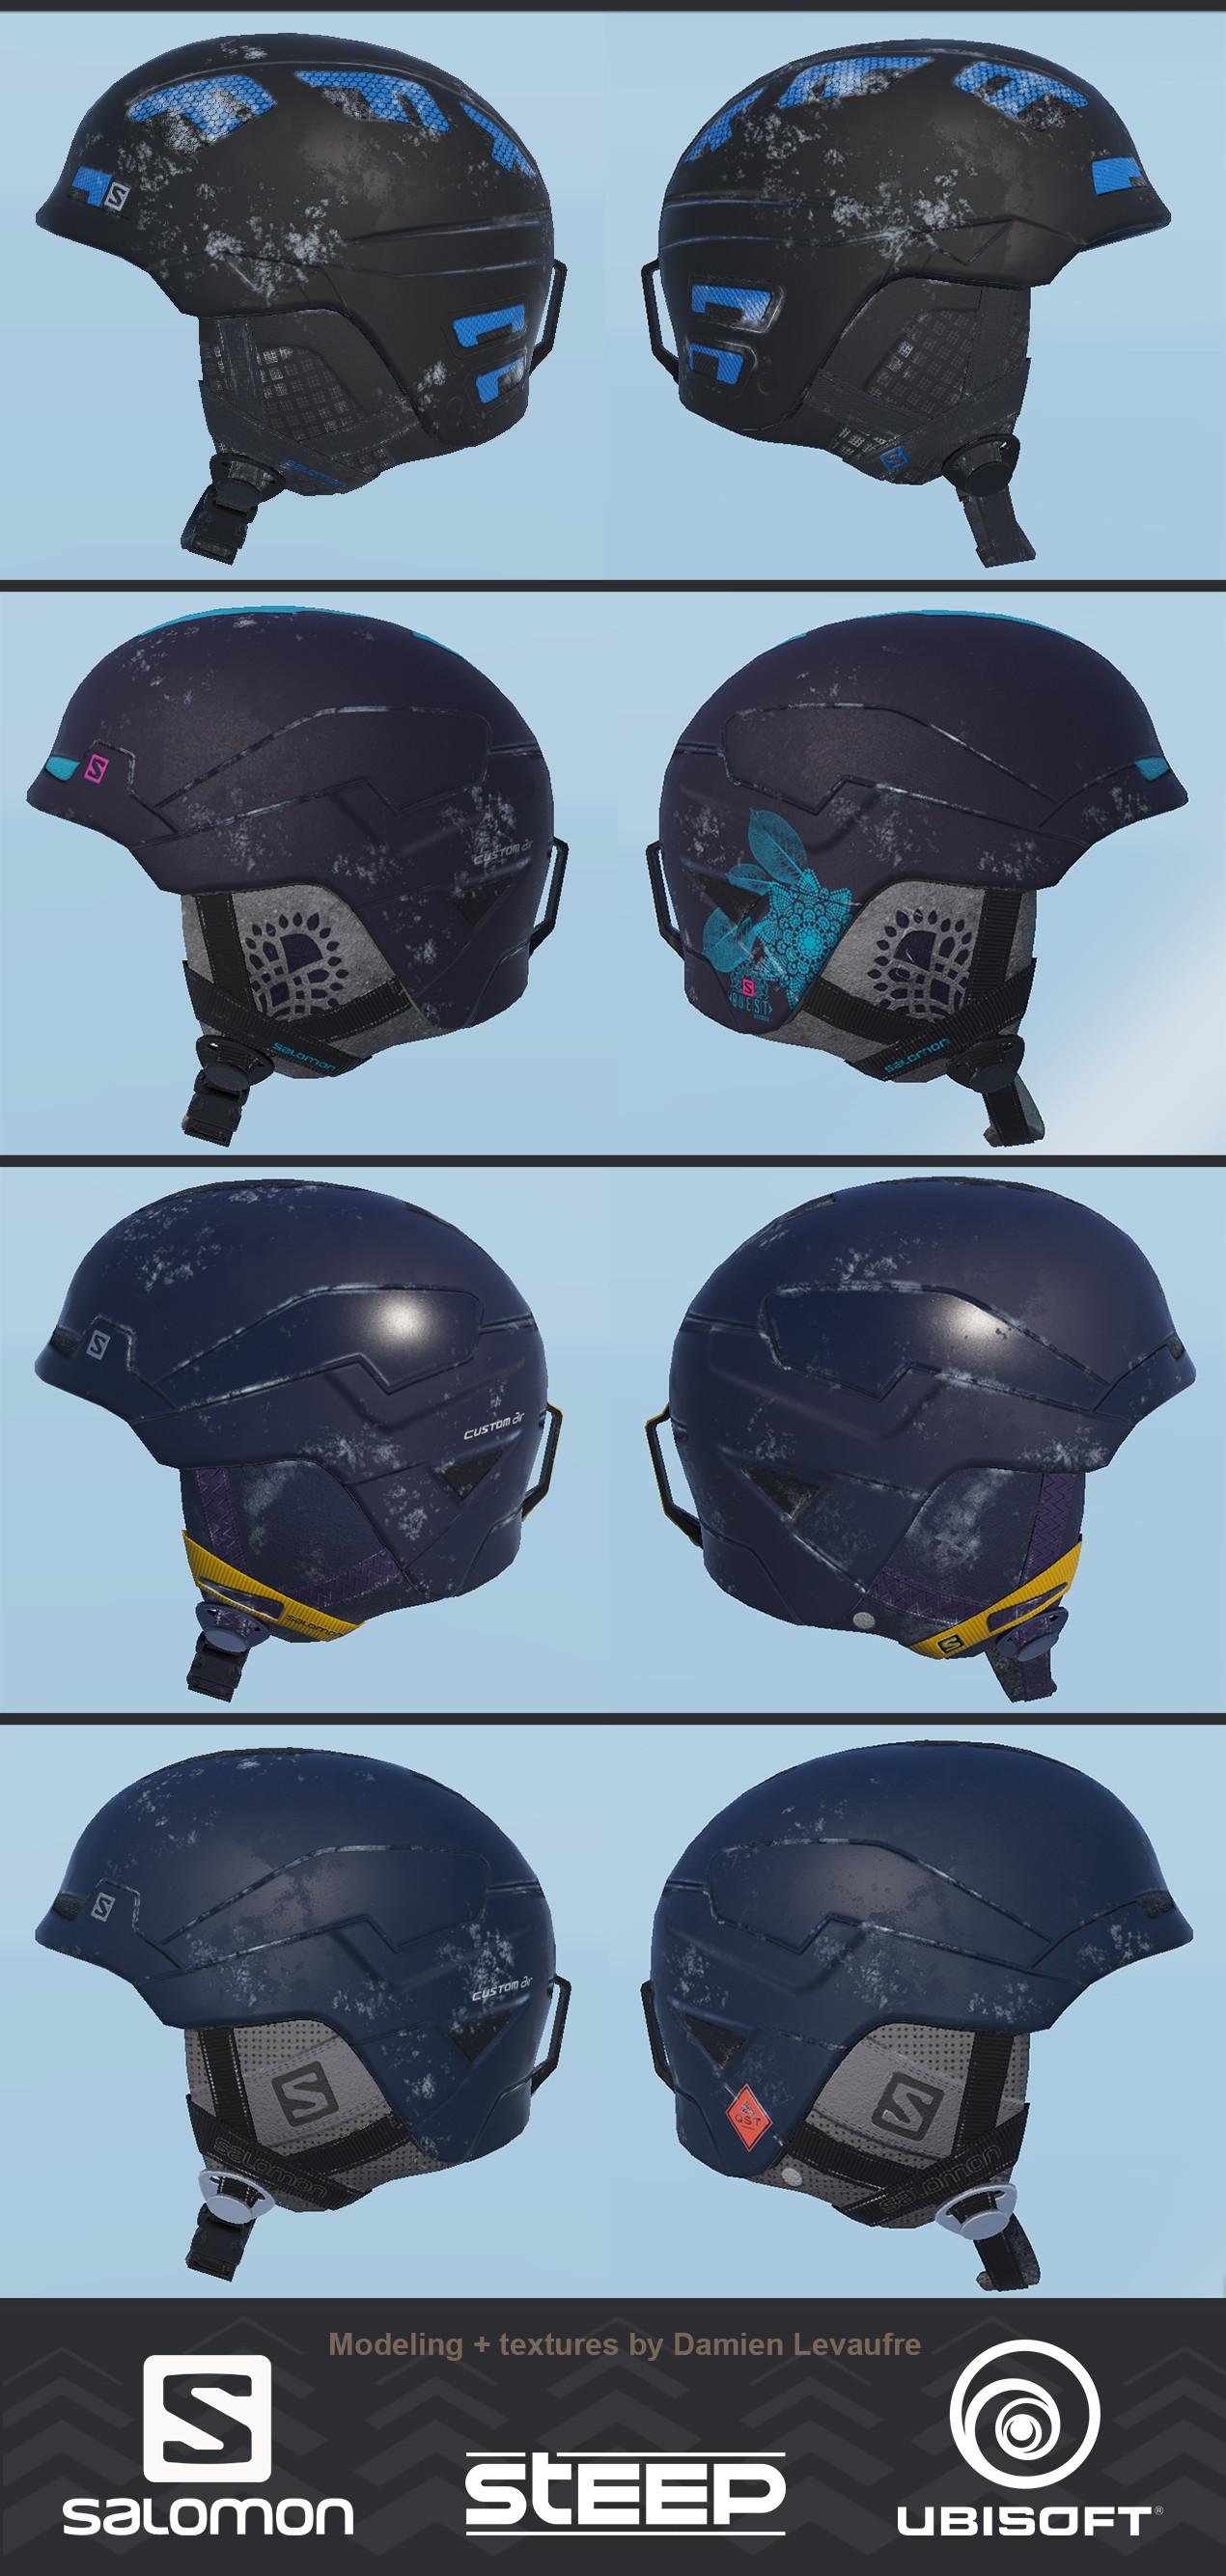 Damien levaufre helmet 004 salomon presentation